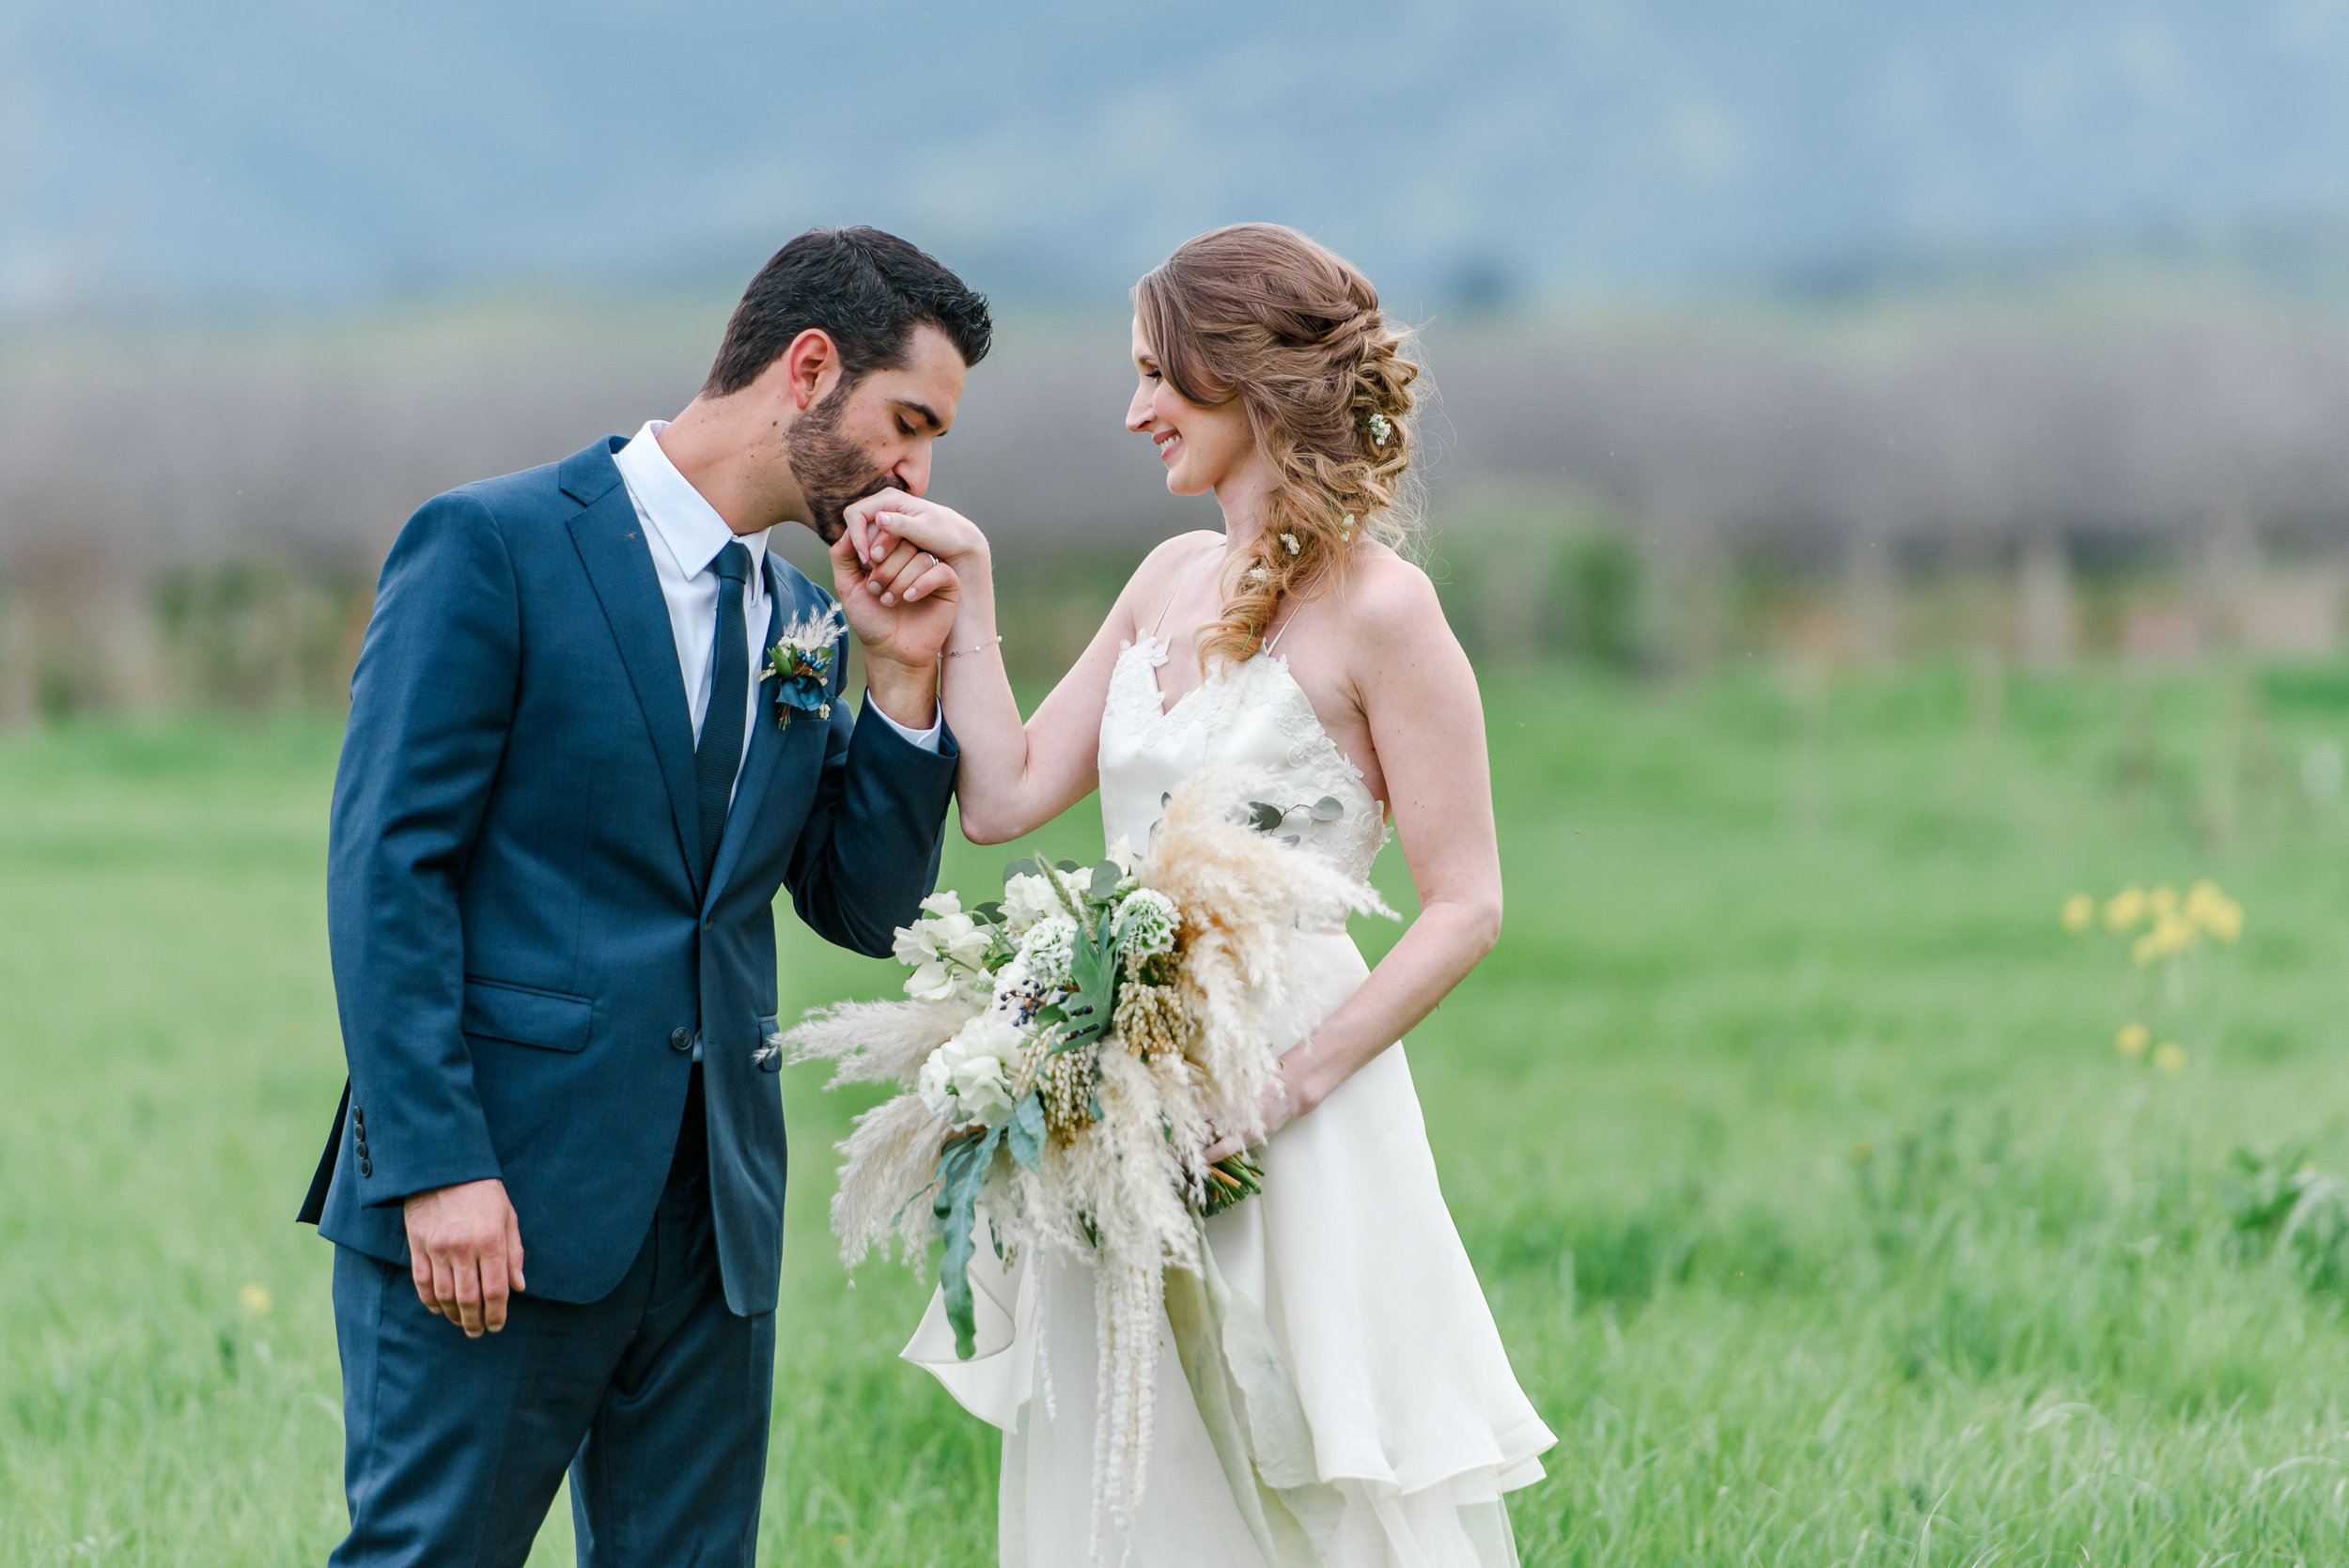 Bride and Groom Photos | Bridal Bouquet | Blue Wedding Suit